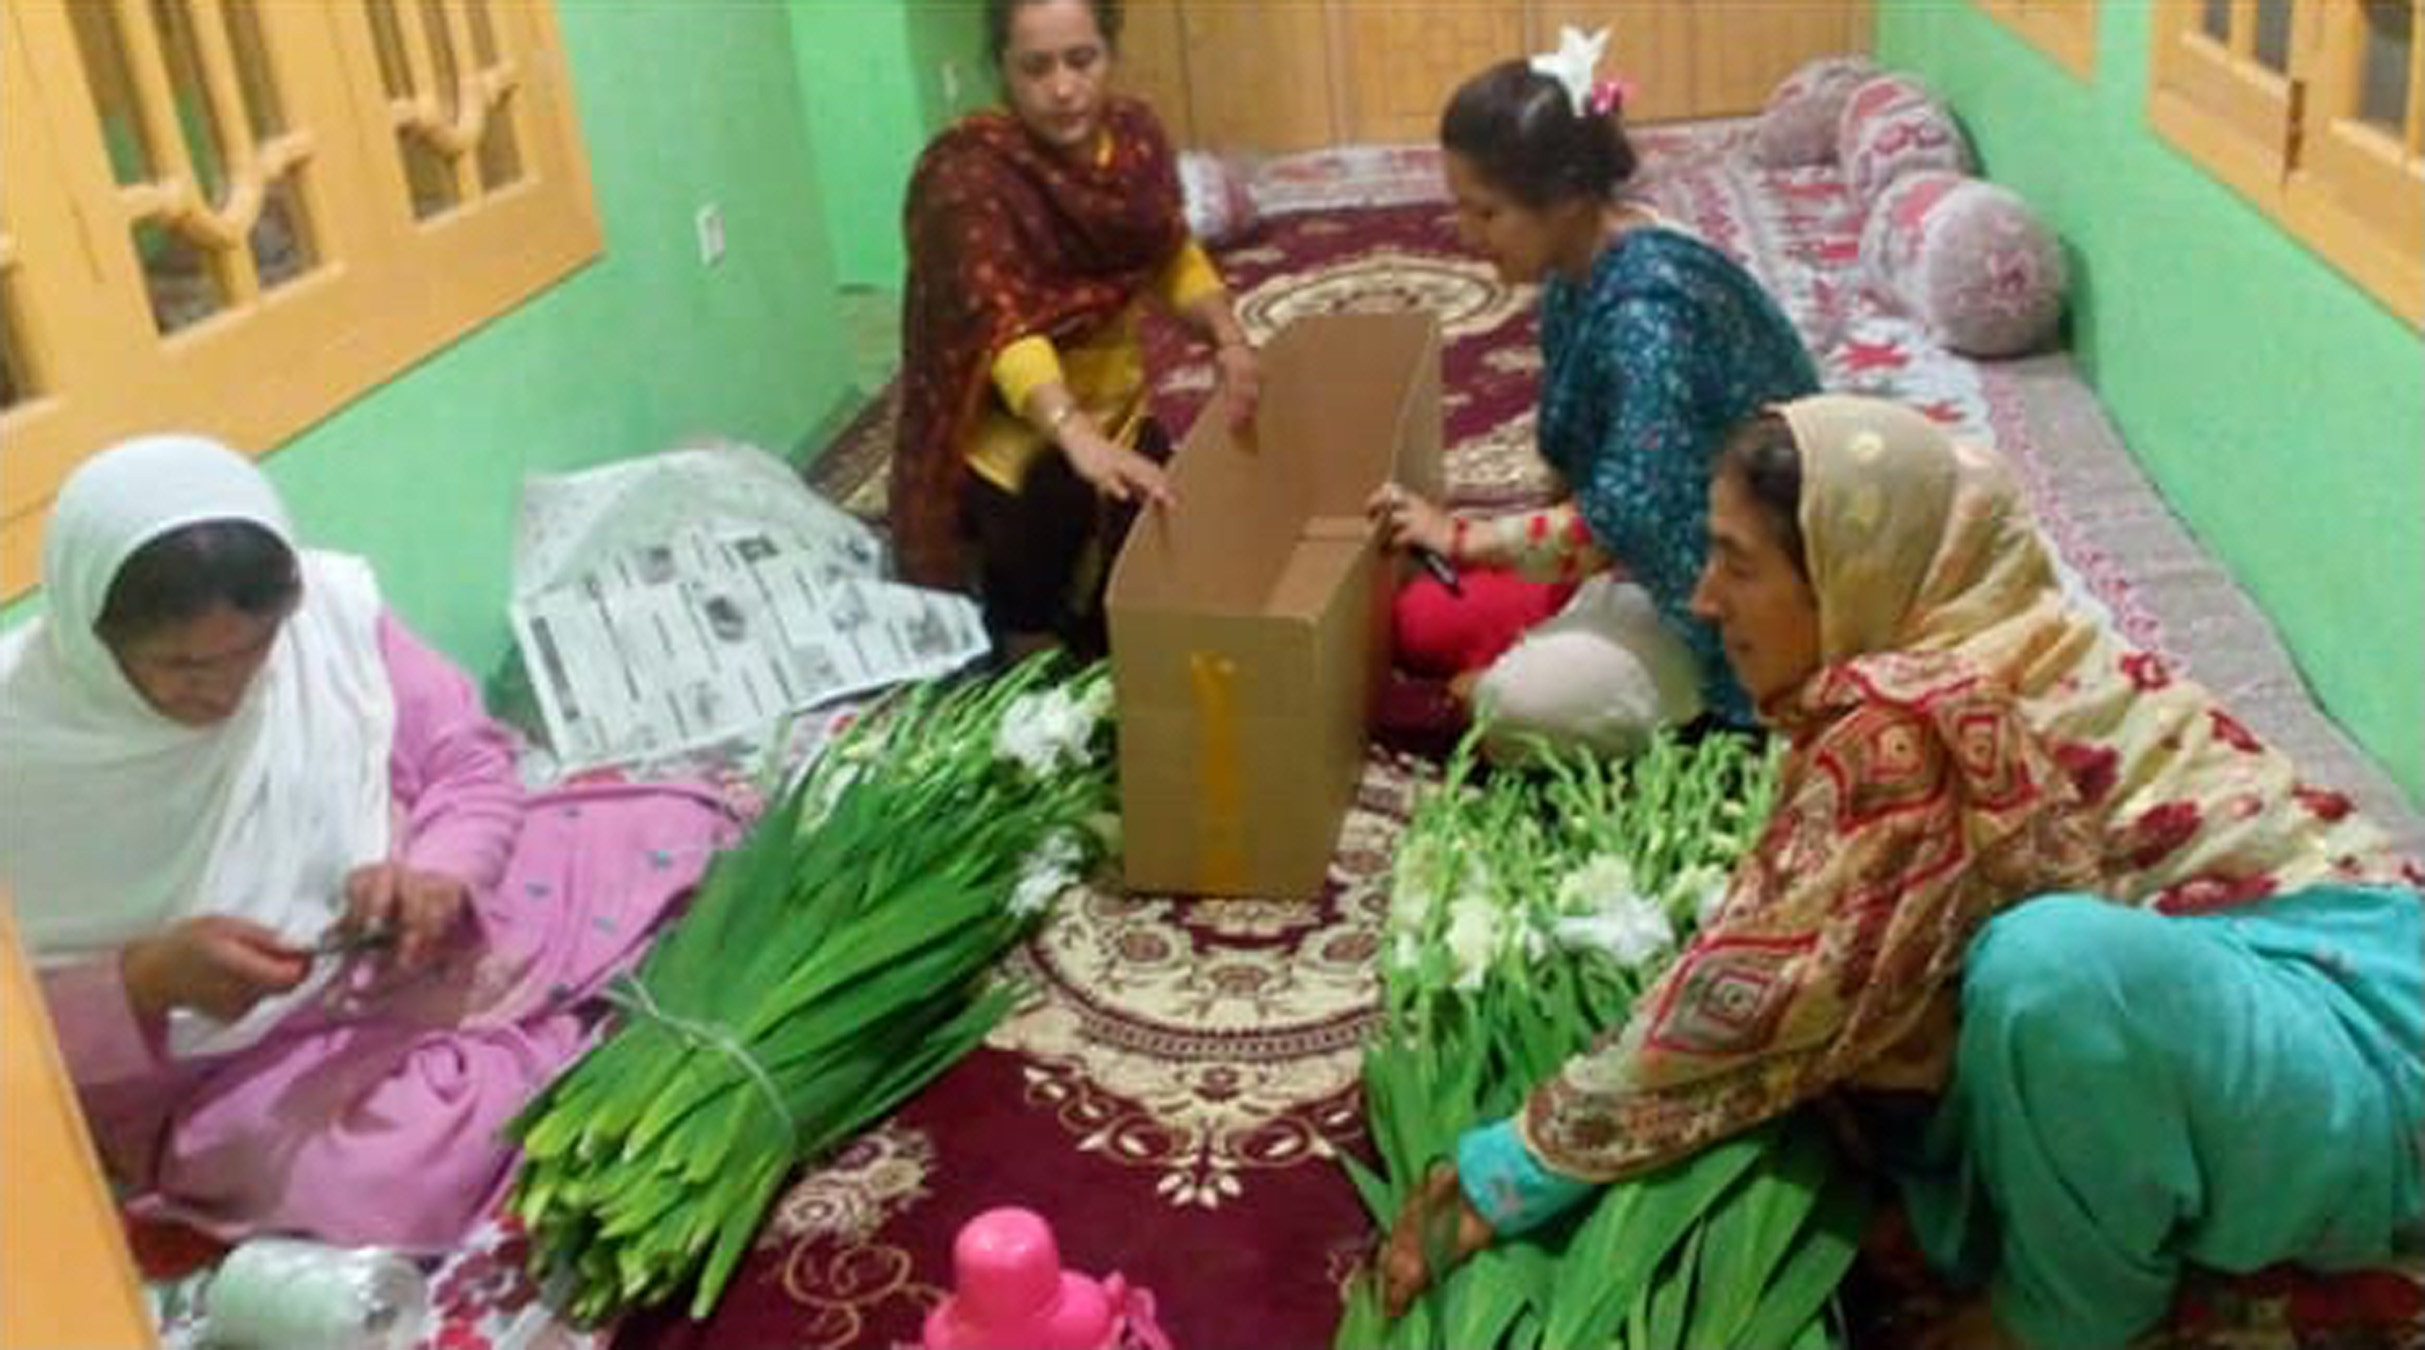 women packaging flowers for sale